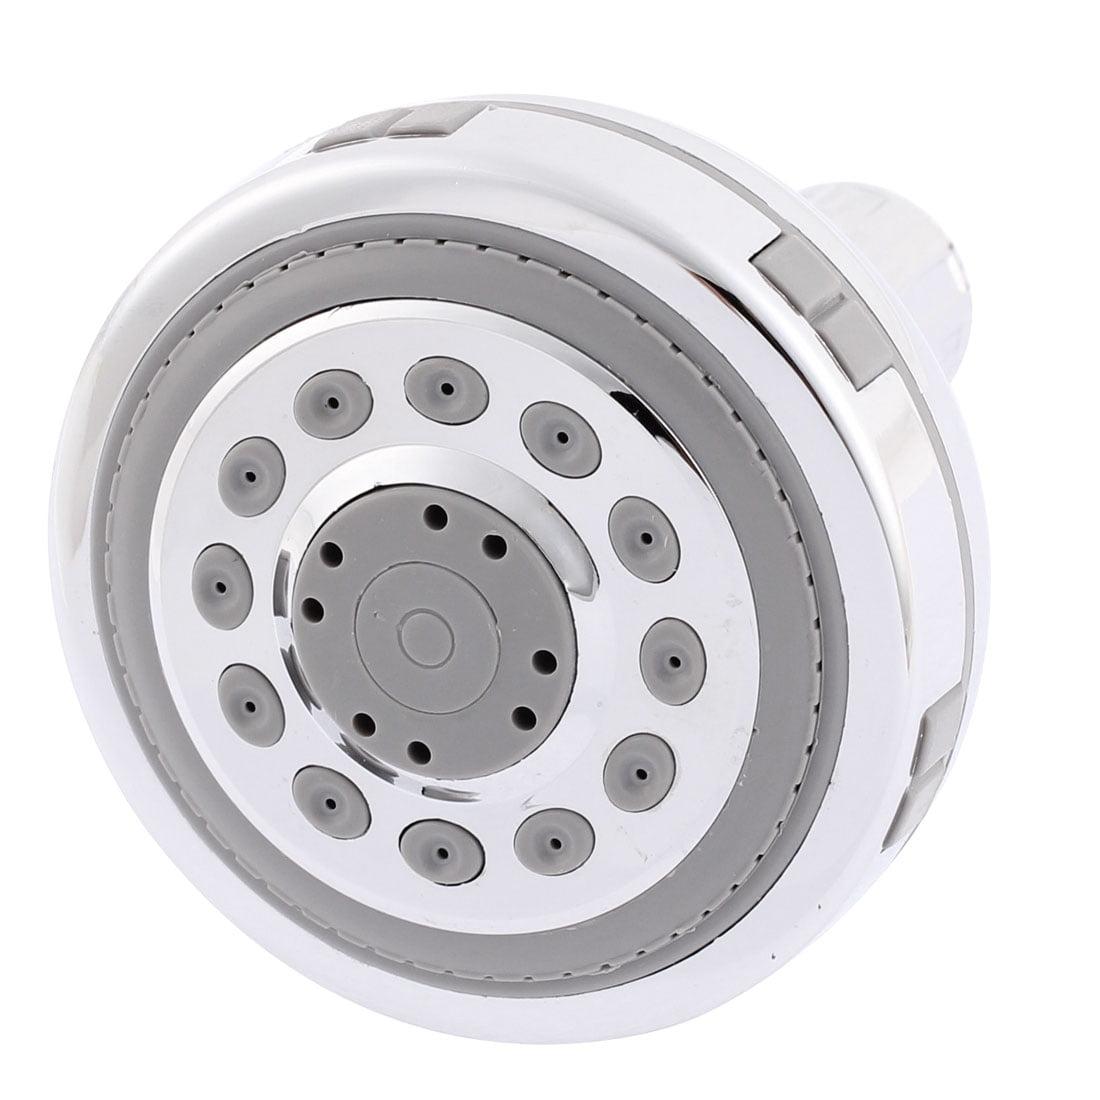 8cm Dia Round Design Bathroom Rainfall Shower Head